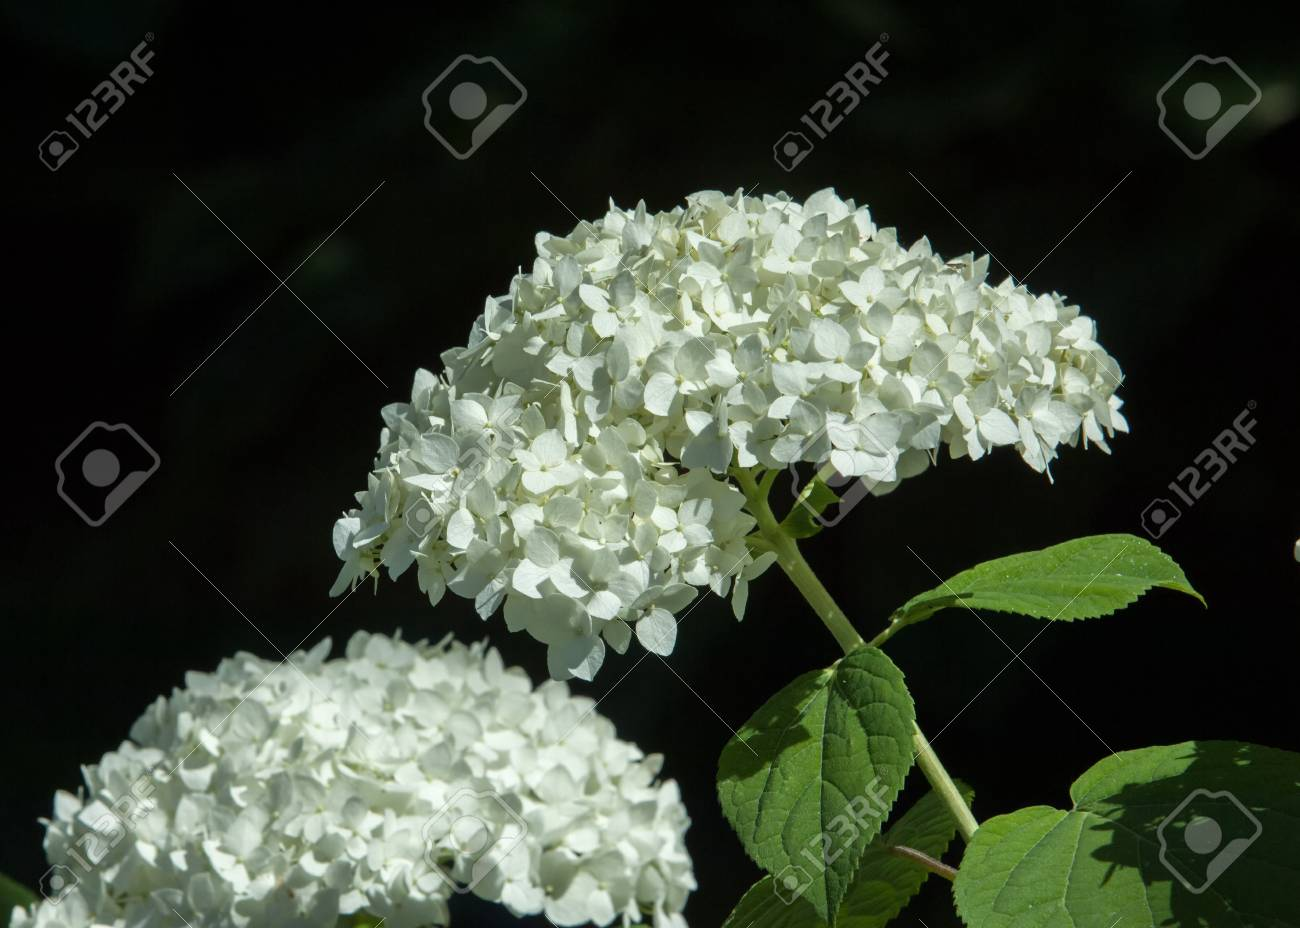 Decorative Bush Viburnum Or Buldonezh Viburnum With White Flowers